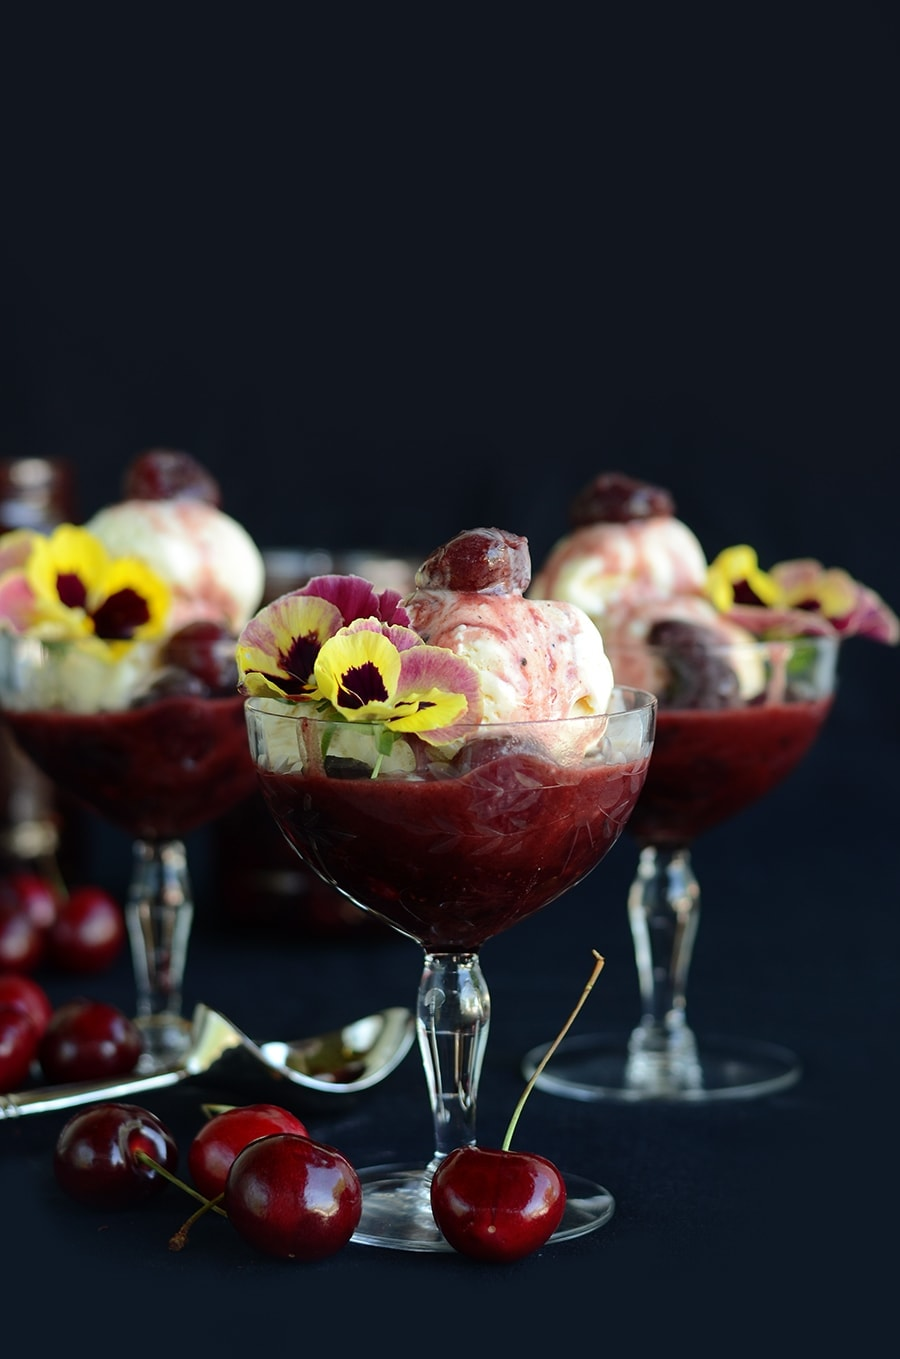 Melting Sundaes Web - Grilled Cherries in Spiced Butter Rum Sauce